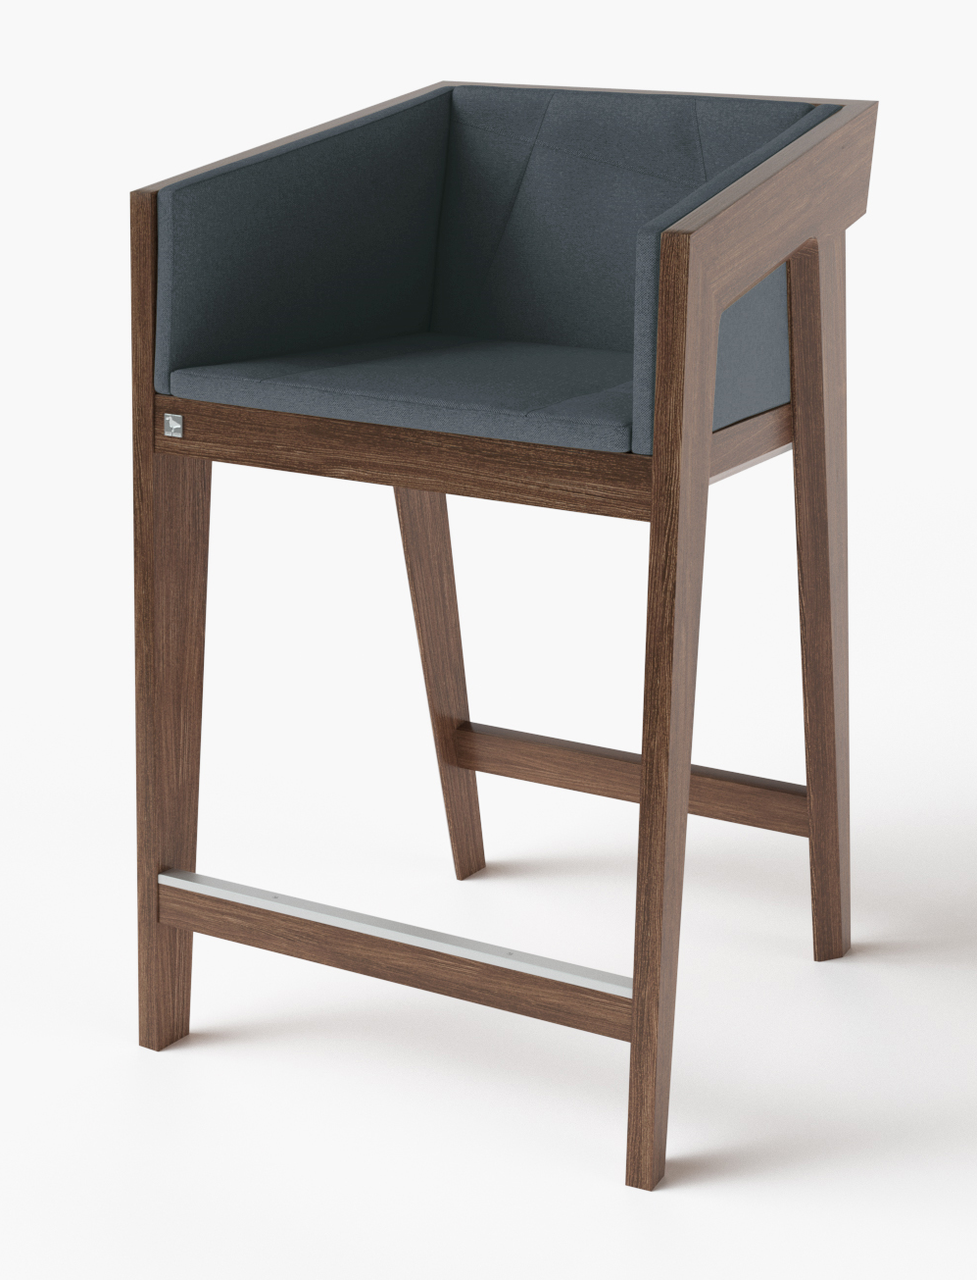 Полубарный стул Air 2 bar s 4 soft brown ТМ Kint